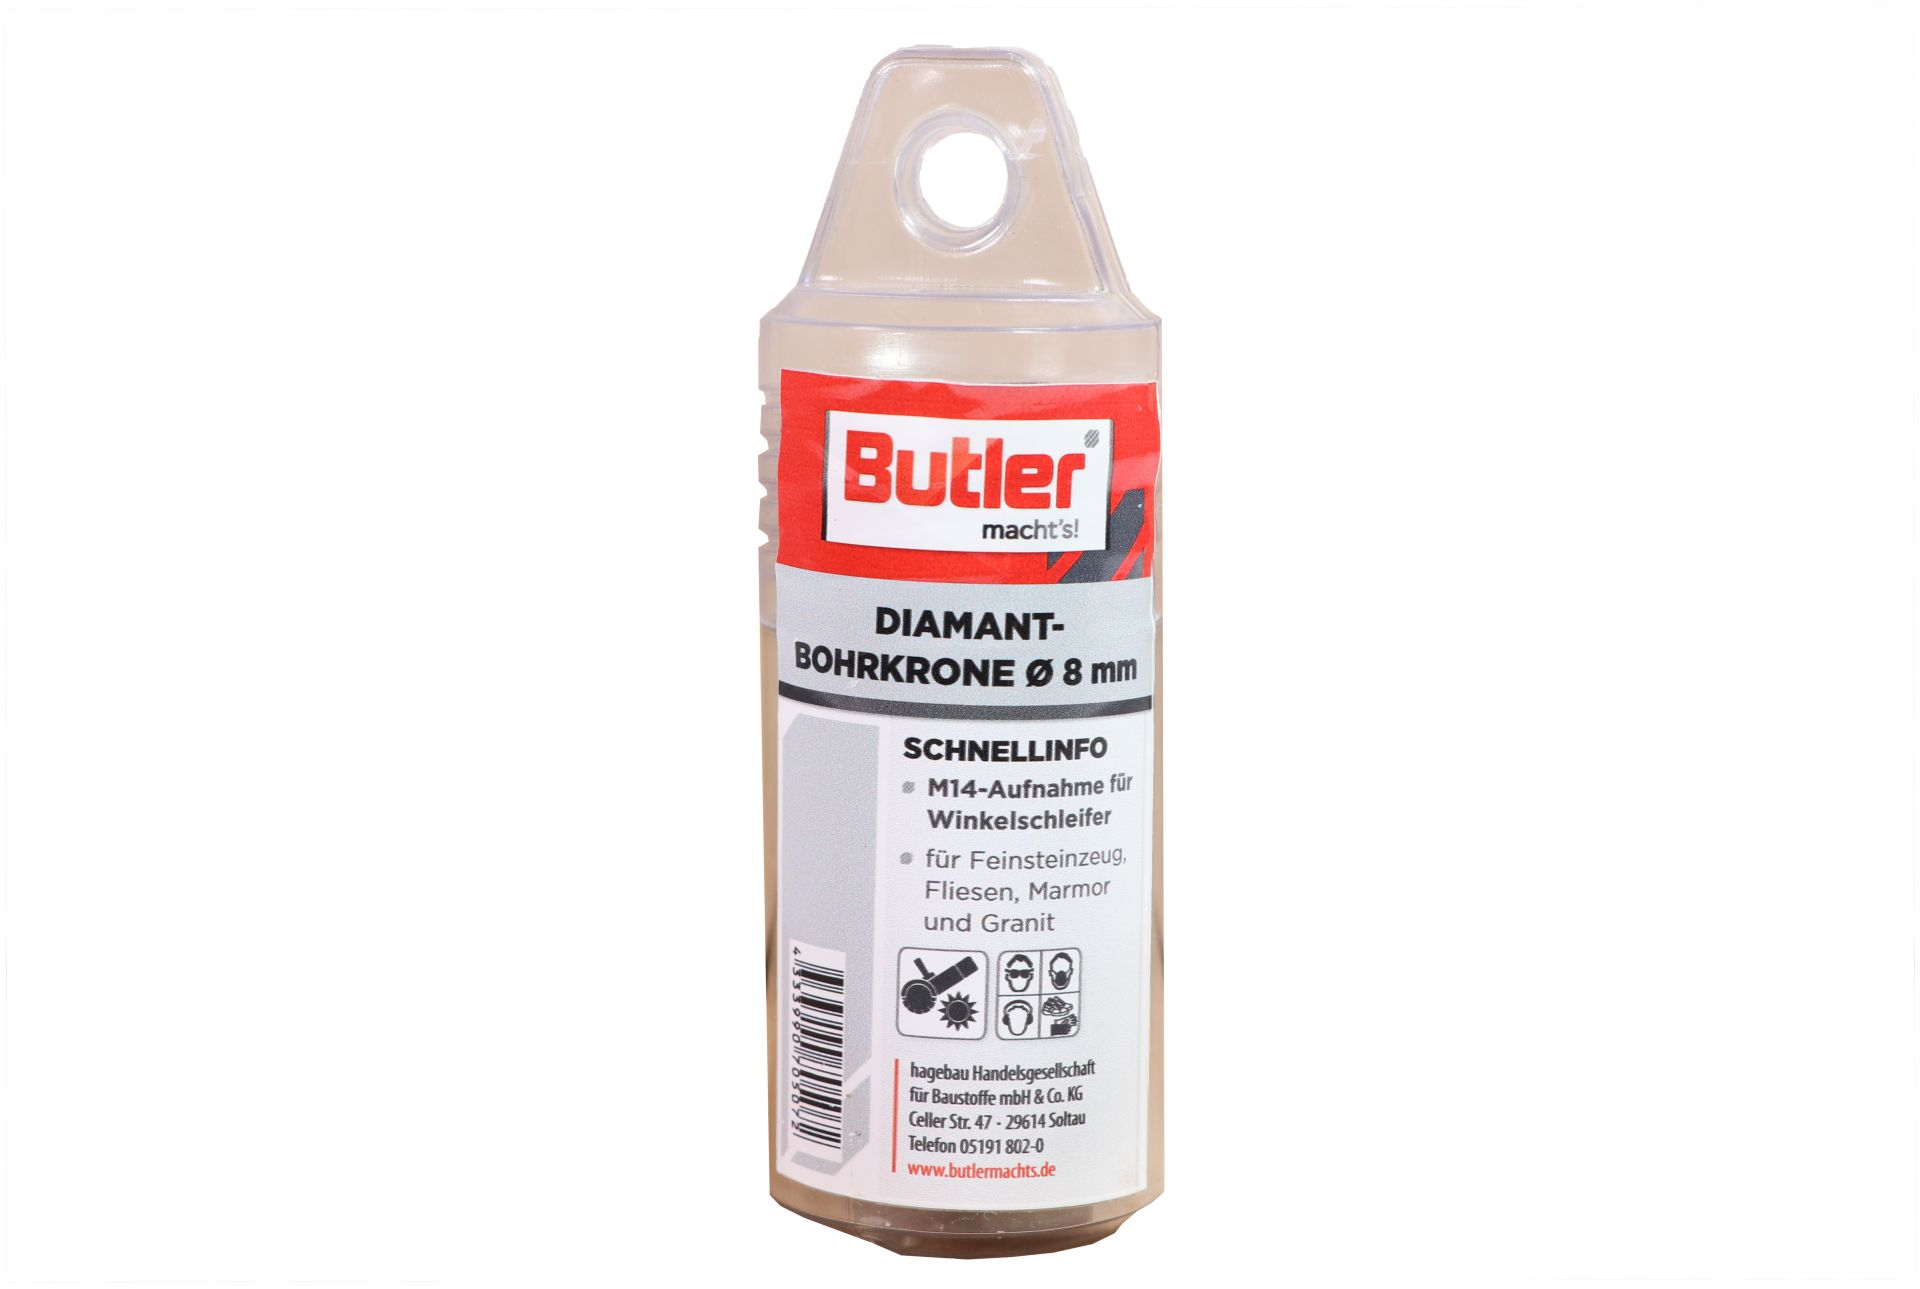 Butler macht's! Diamant-Bohrkrone, Ø 8 mm, Aufnahme M14, Bohrtiefe 35 mm